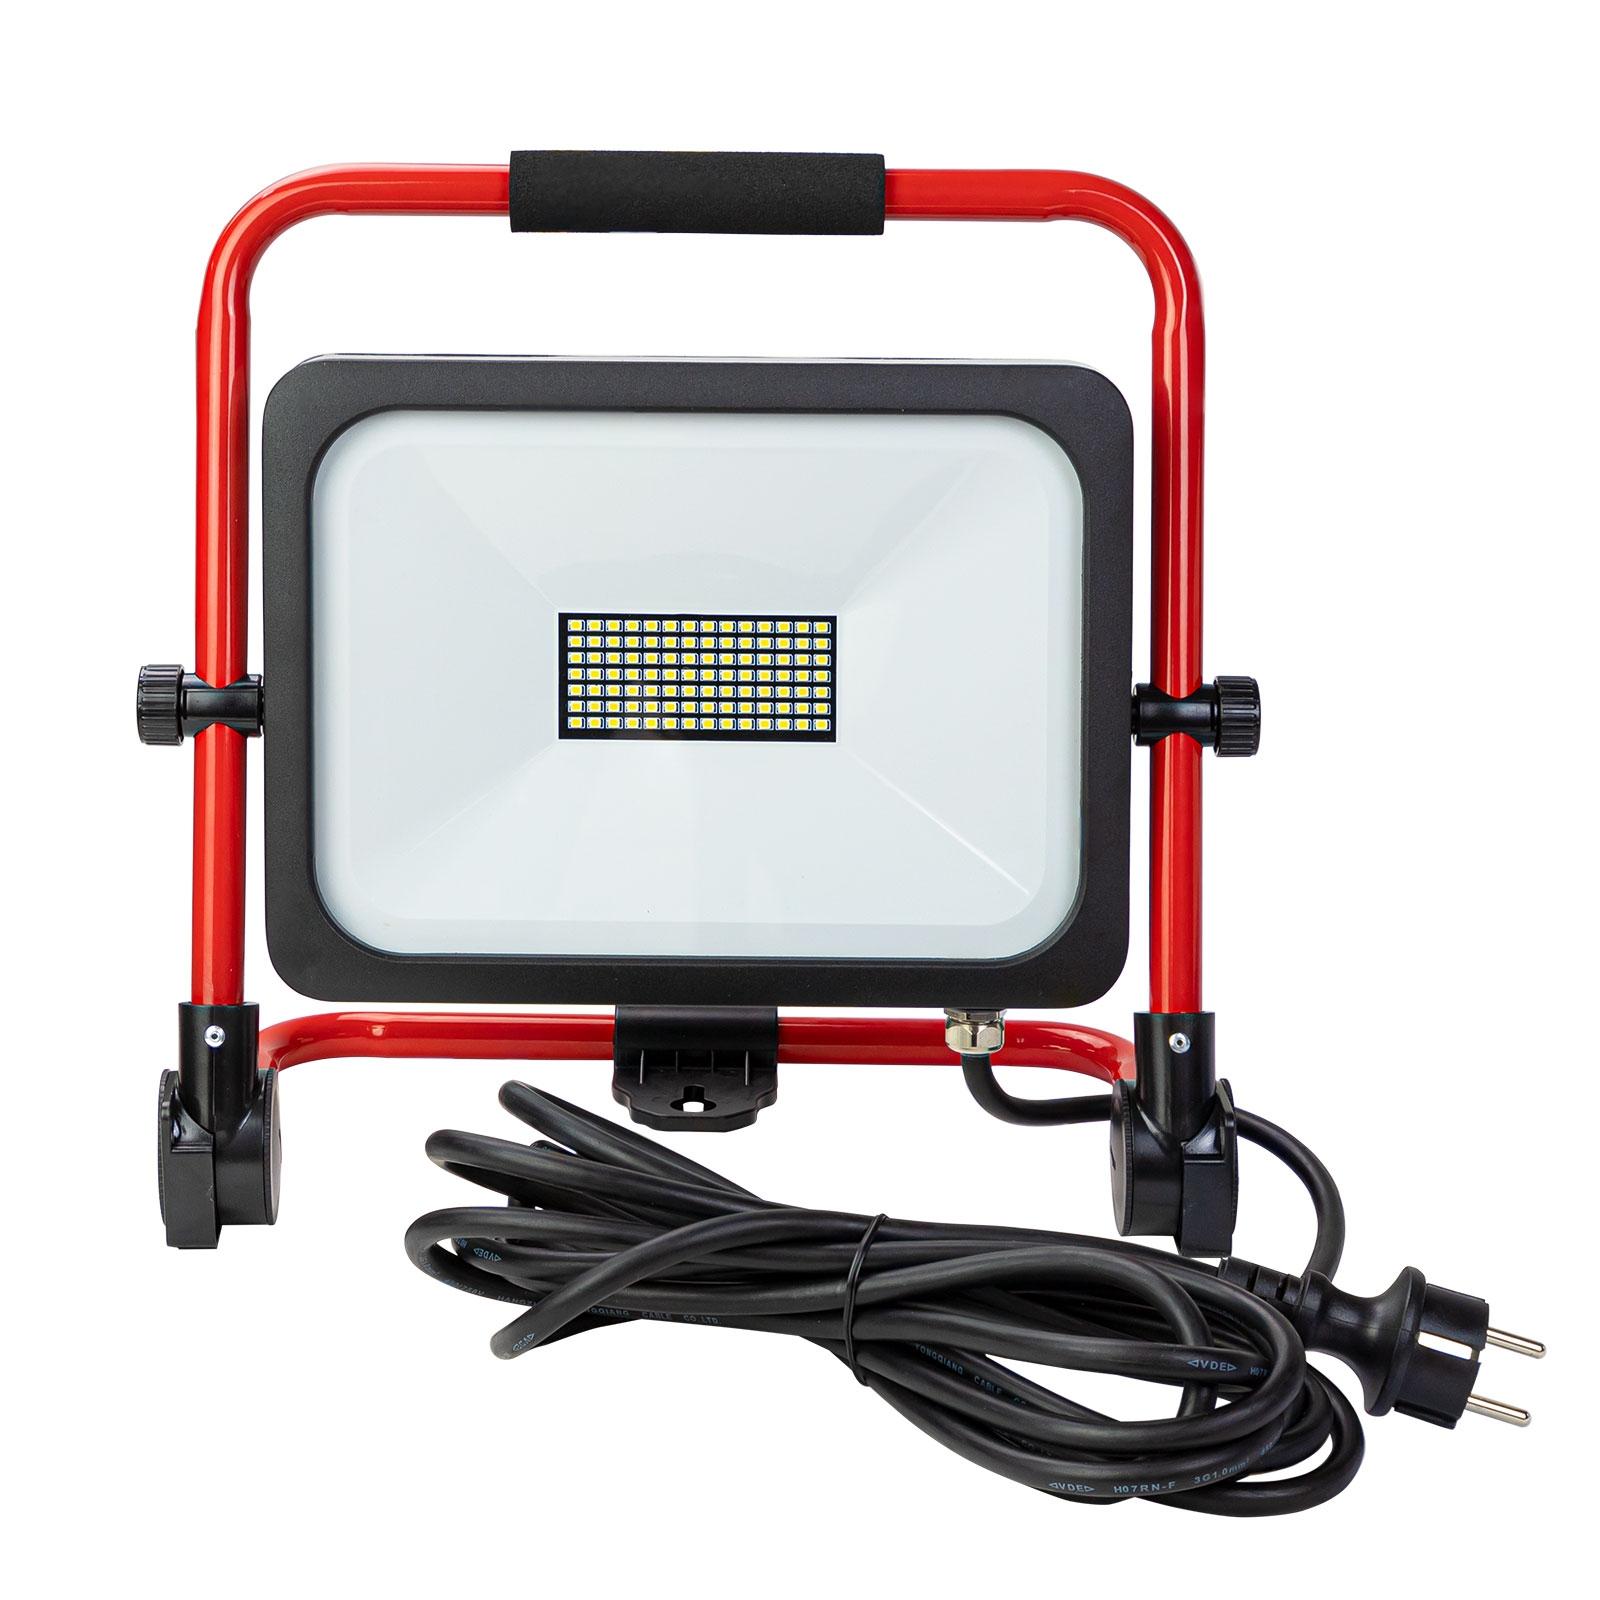 Dema LED-Strahler Slim 50W Tragegestell LED Arbeitsleuchte Baustellenlampe Strahler 90055